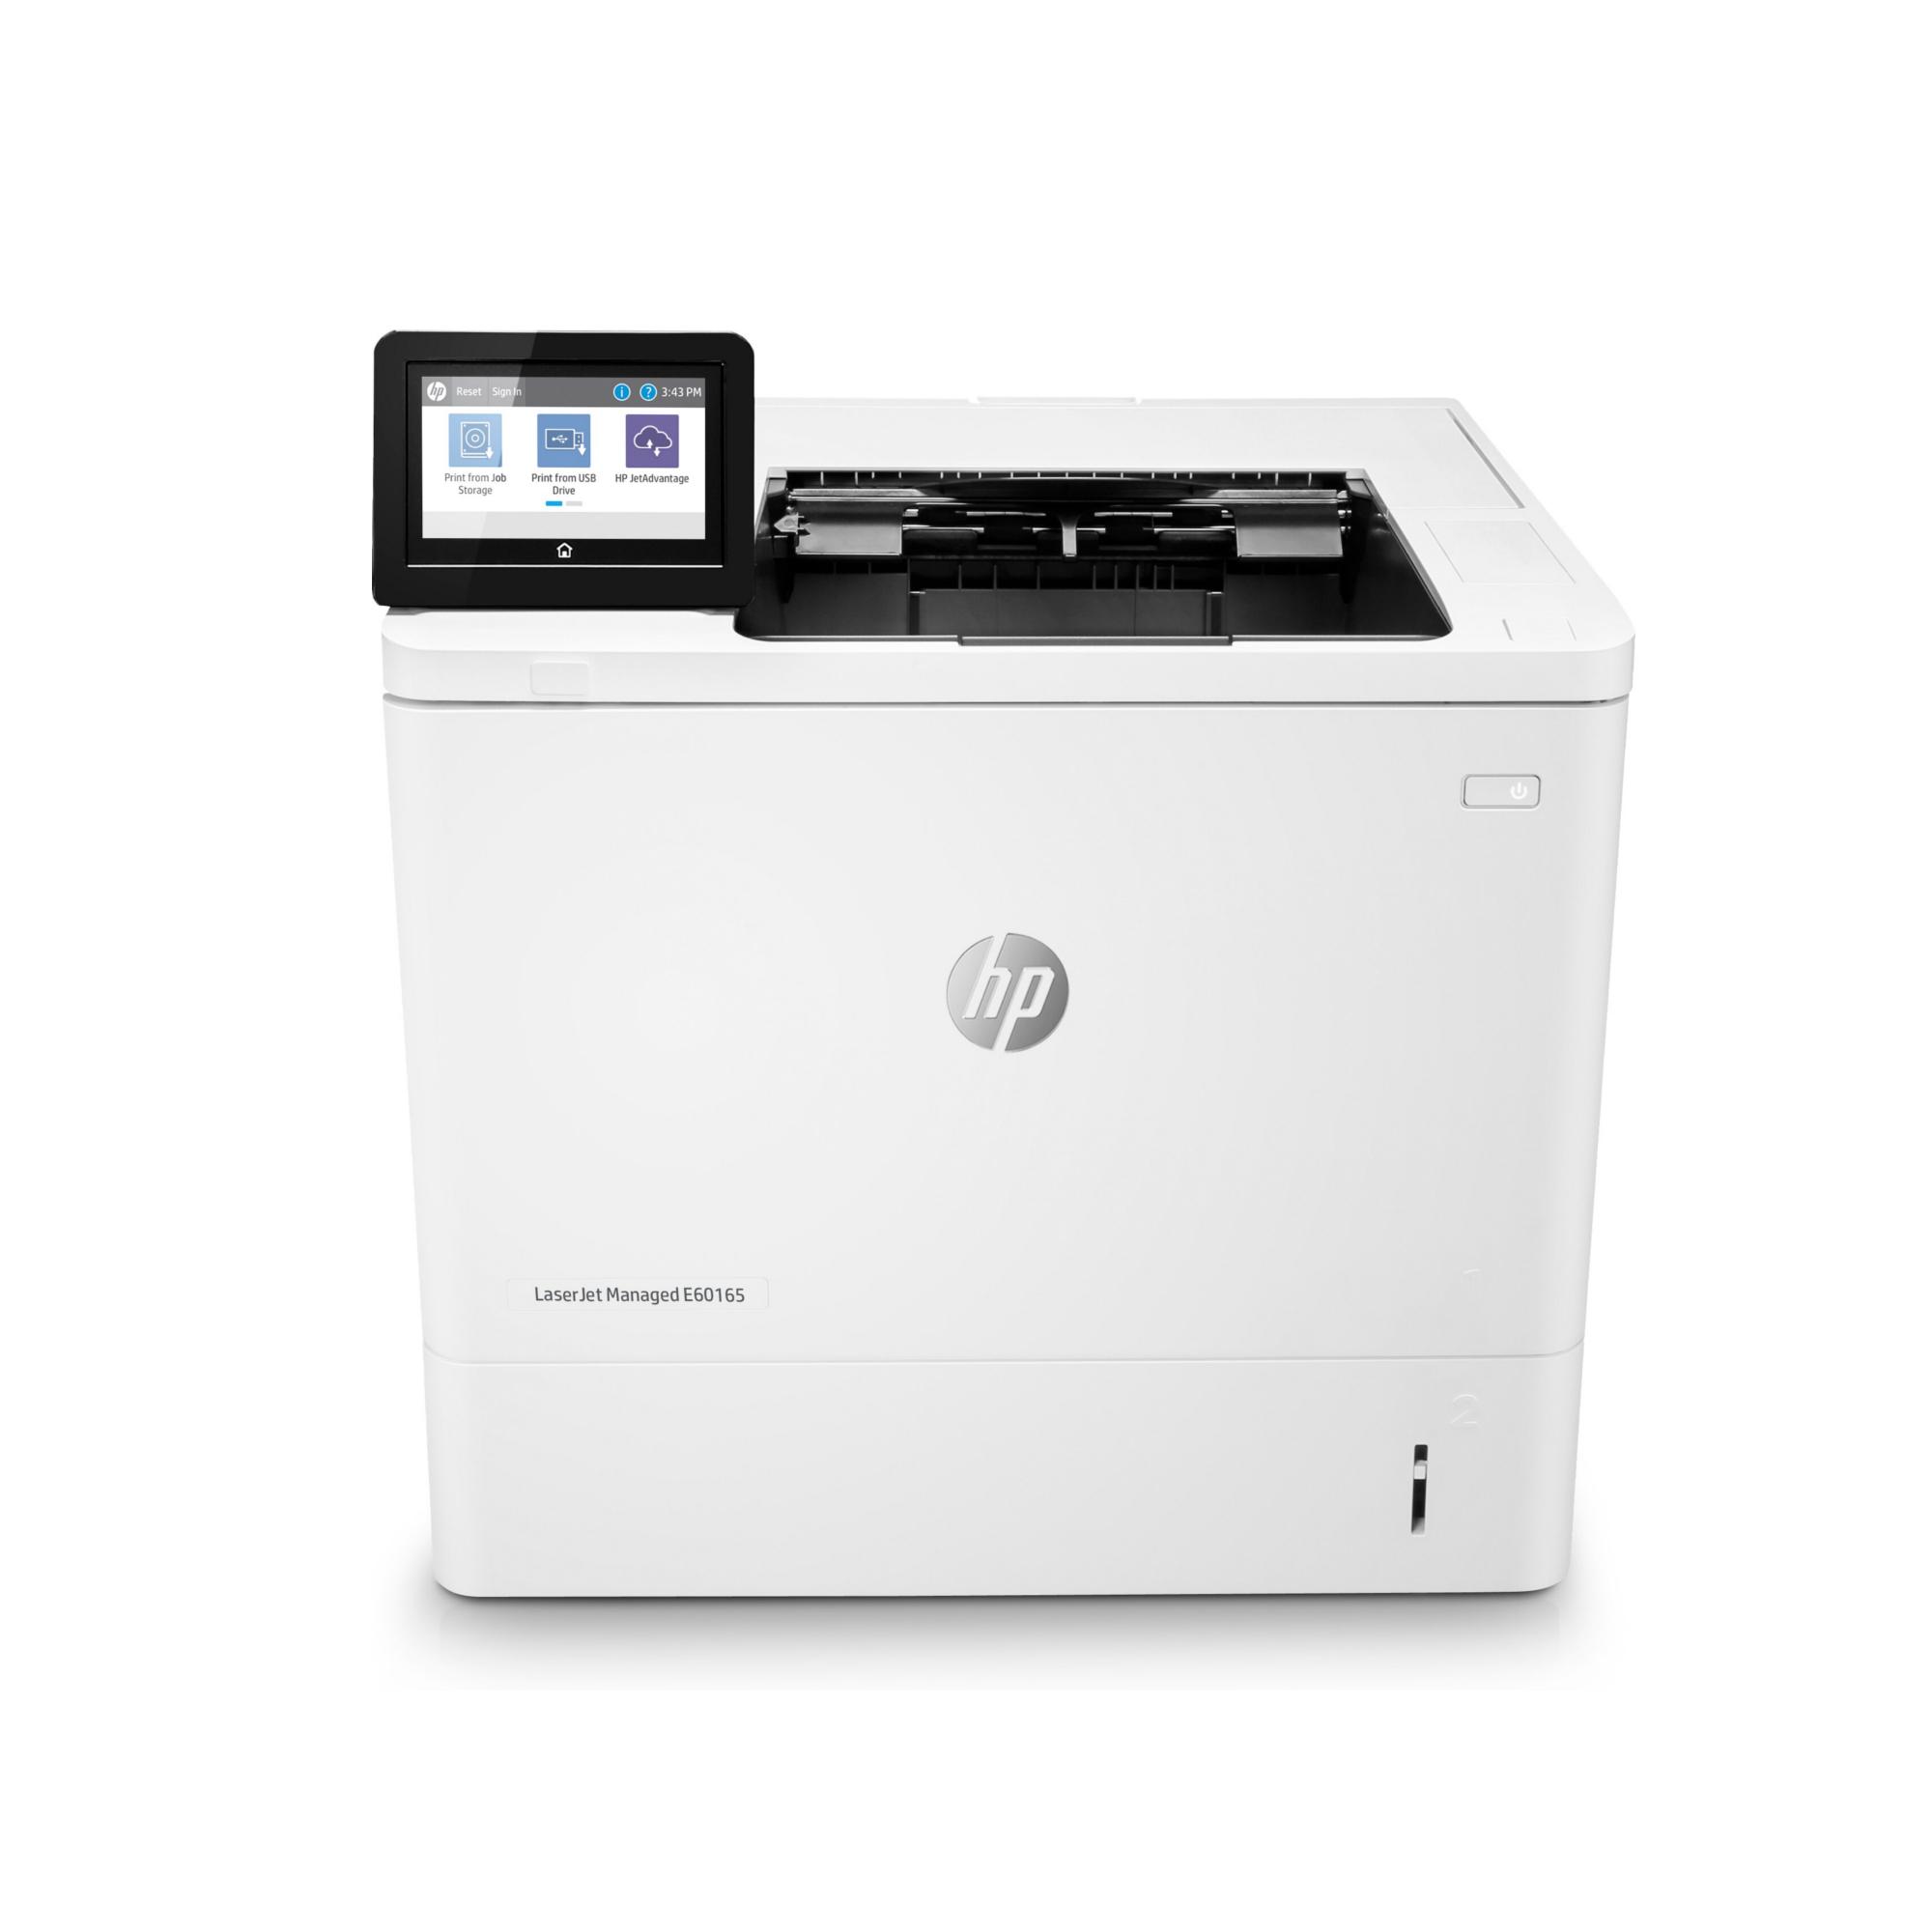 Noleggio Stampante HP LaserJet Managed E60165dn - Lyreco print services